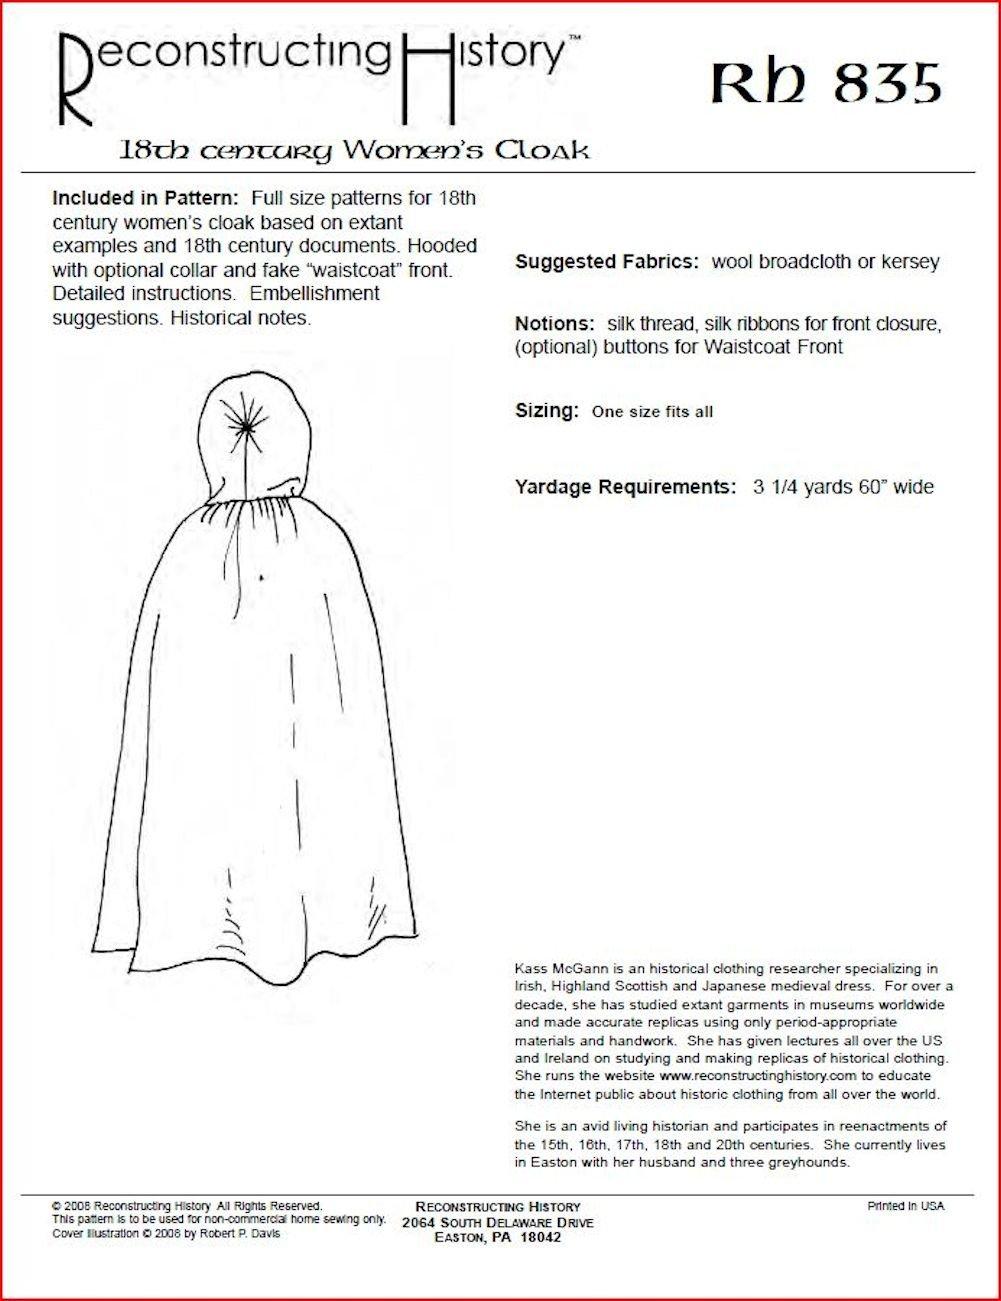 Amazon.com: 18th Century Women\'s Cloak Pattern: Arts, Crafts & Sewing